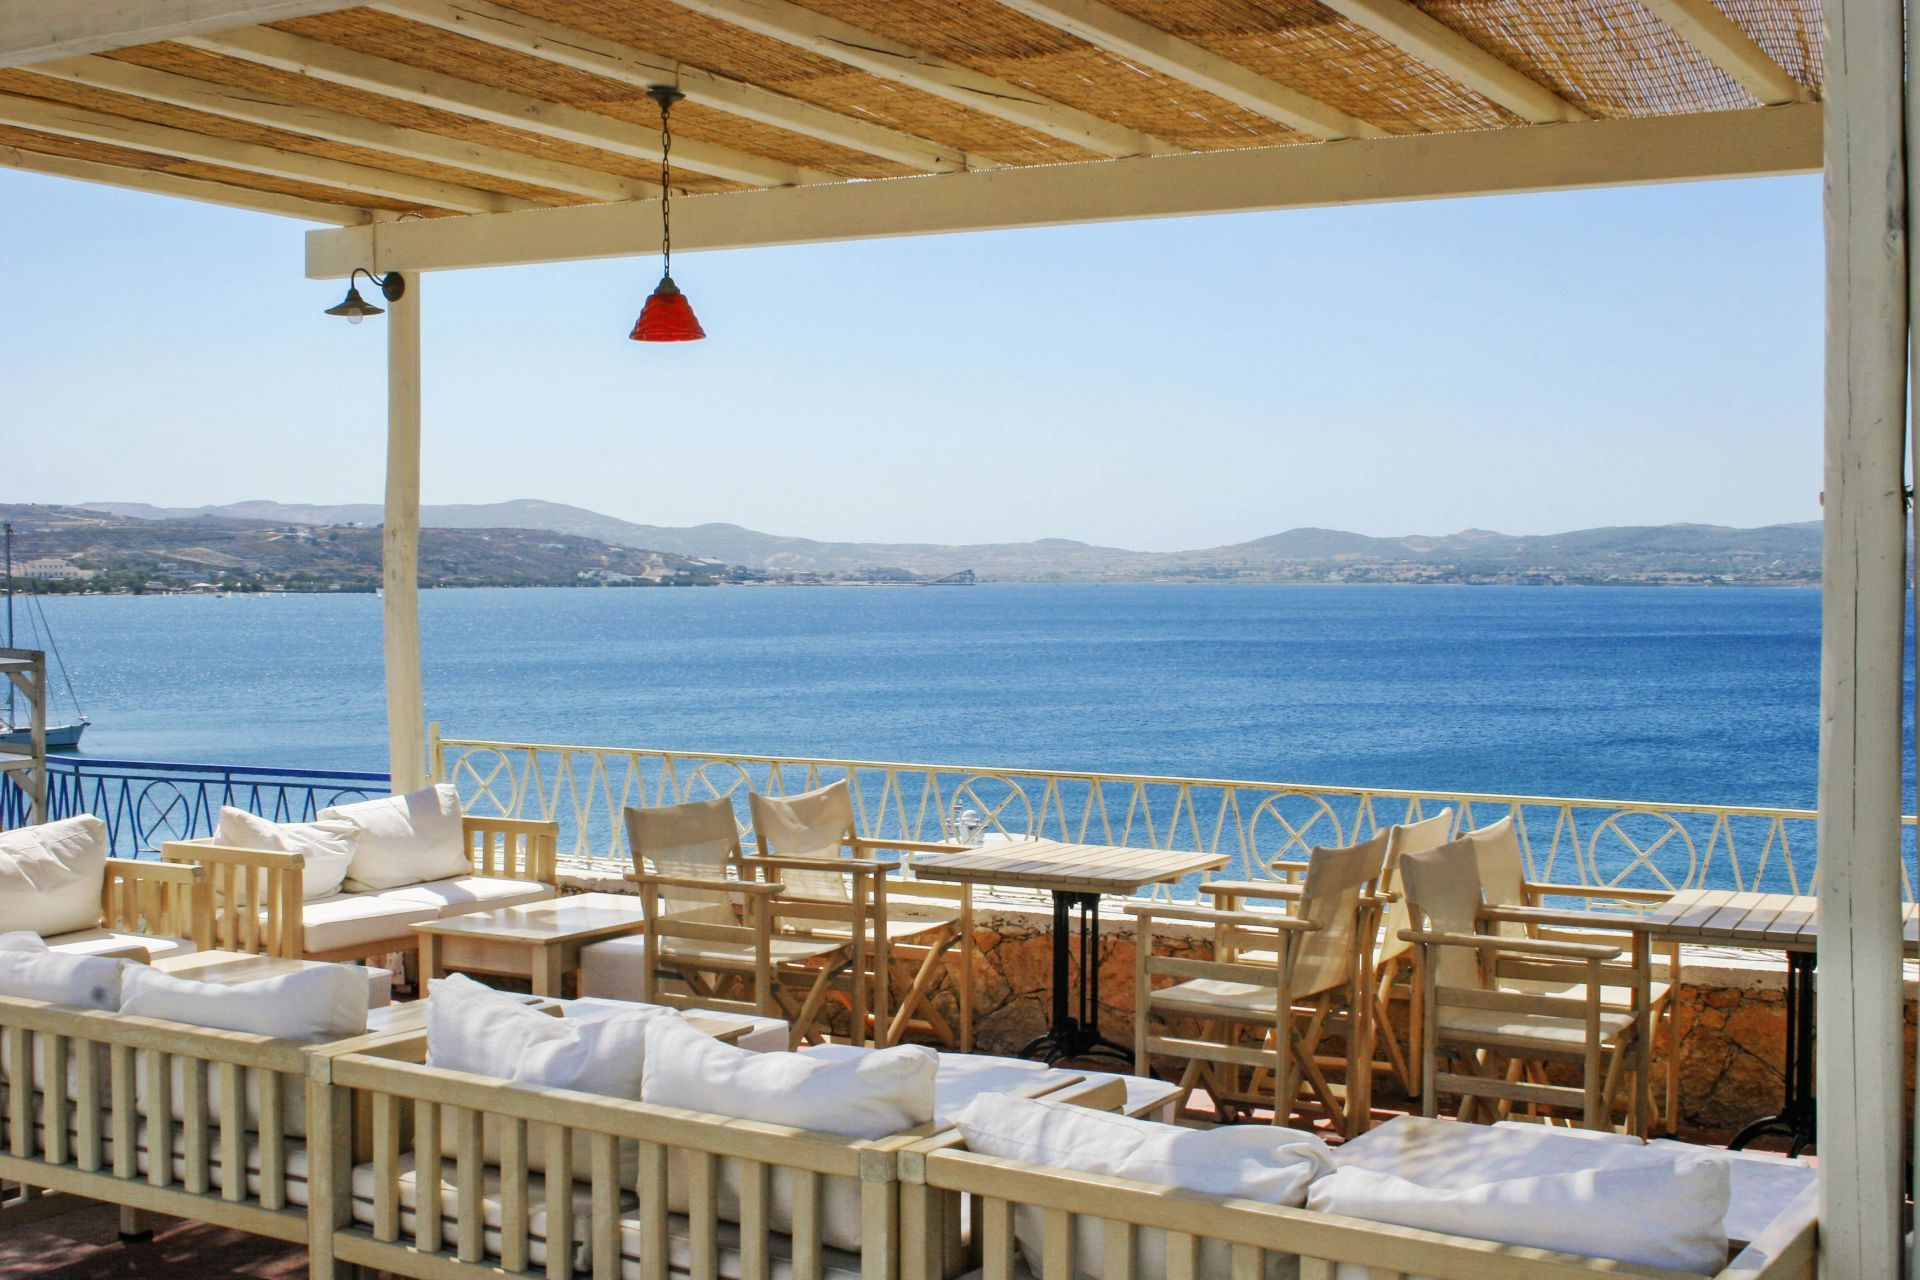 Cafes in Milos